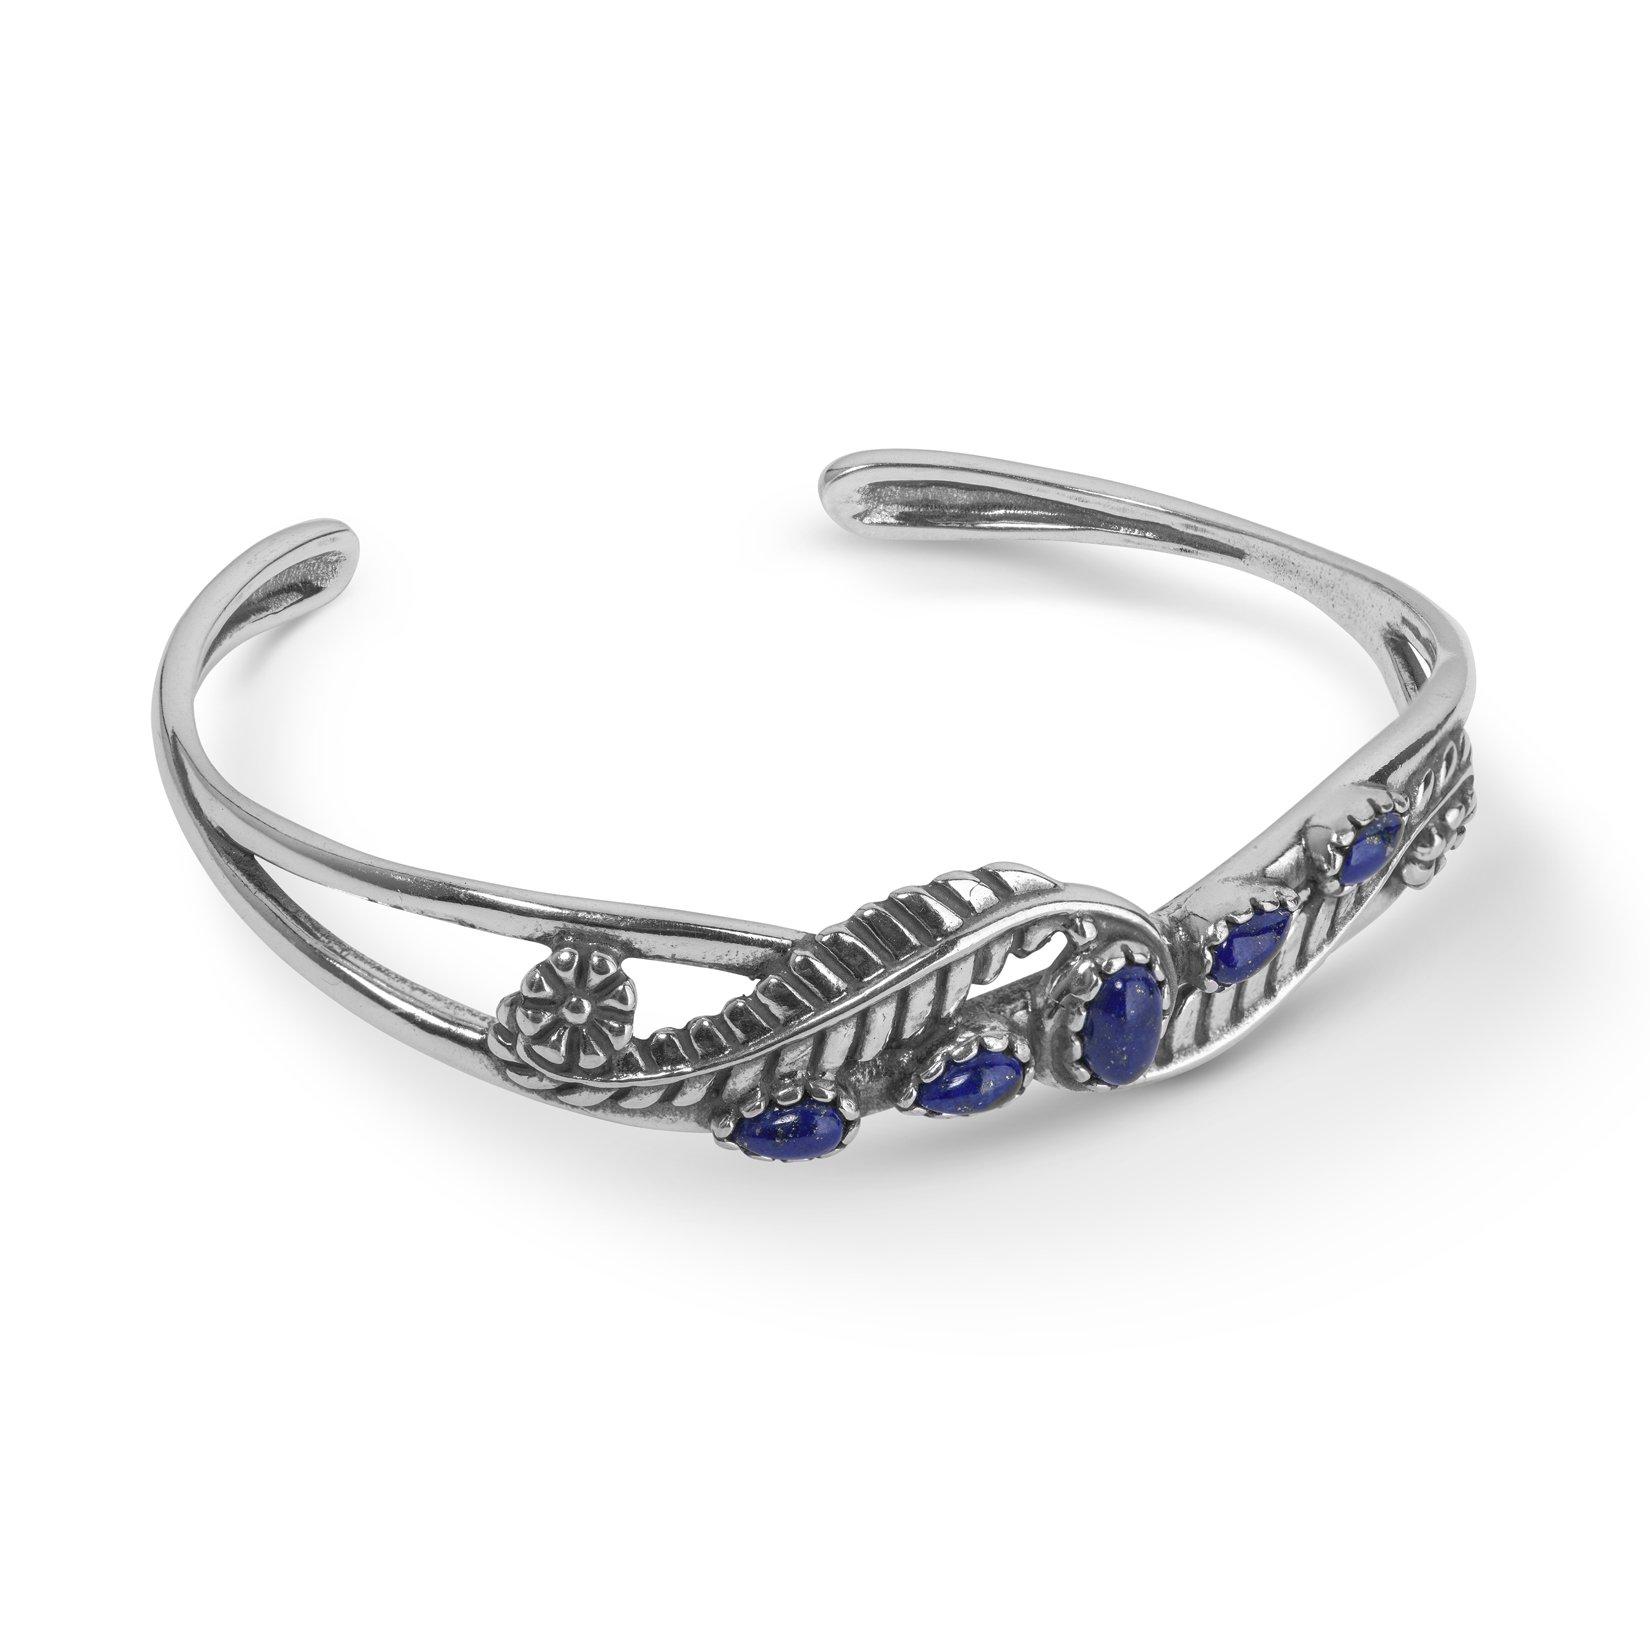 American West Sterling Silver Blue Lapis Gemstone Leaf Rosette Cuff Bracelet Size Medium by American West Jewelry